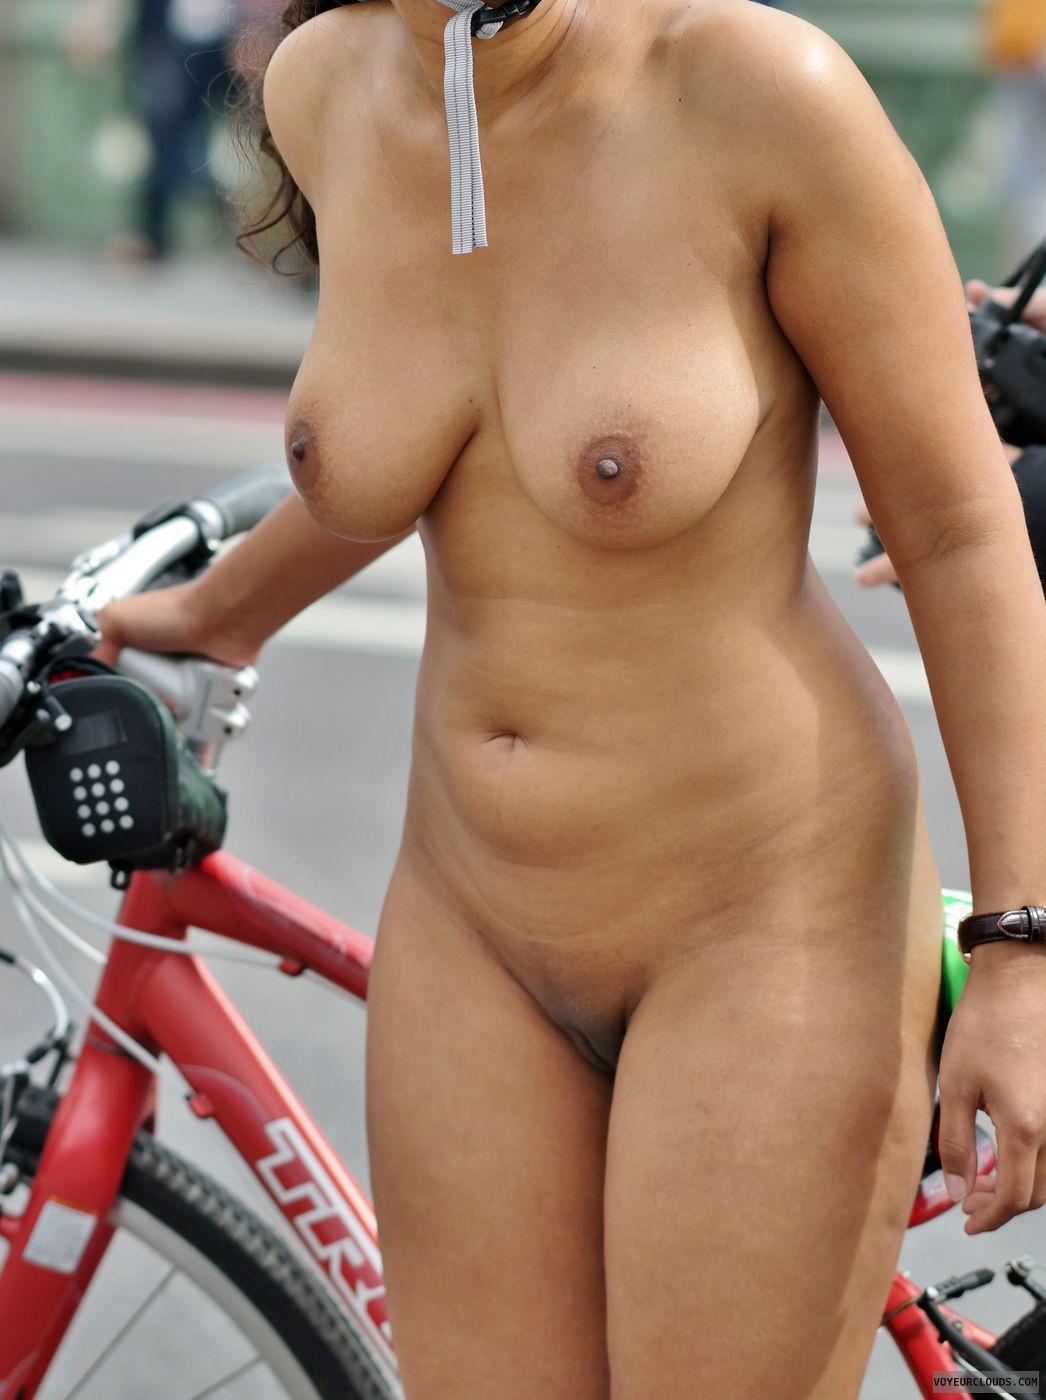 Geneva reccomend Real street voyeur nudity